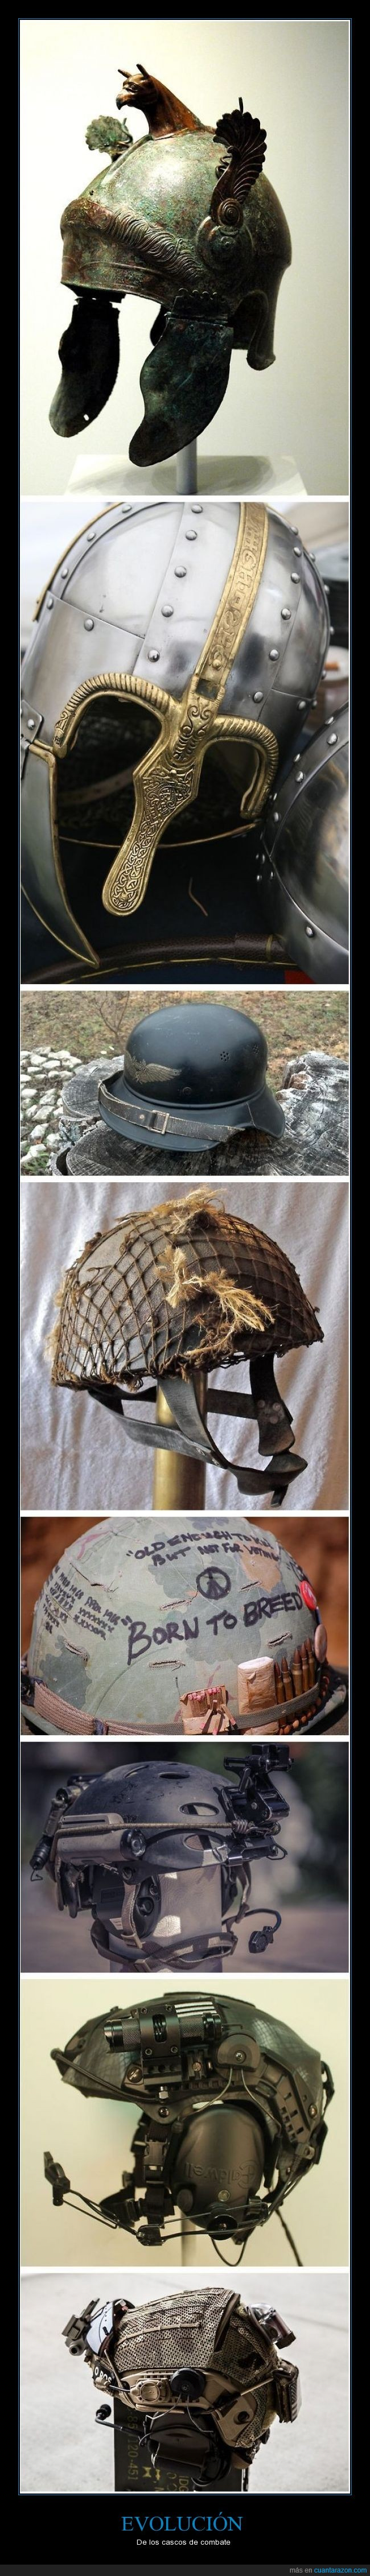 cabeza,cascos,combate,evolucion